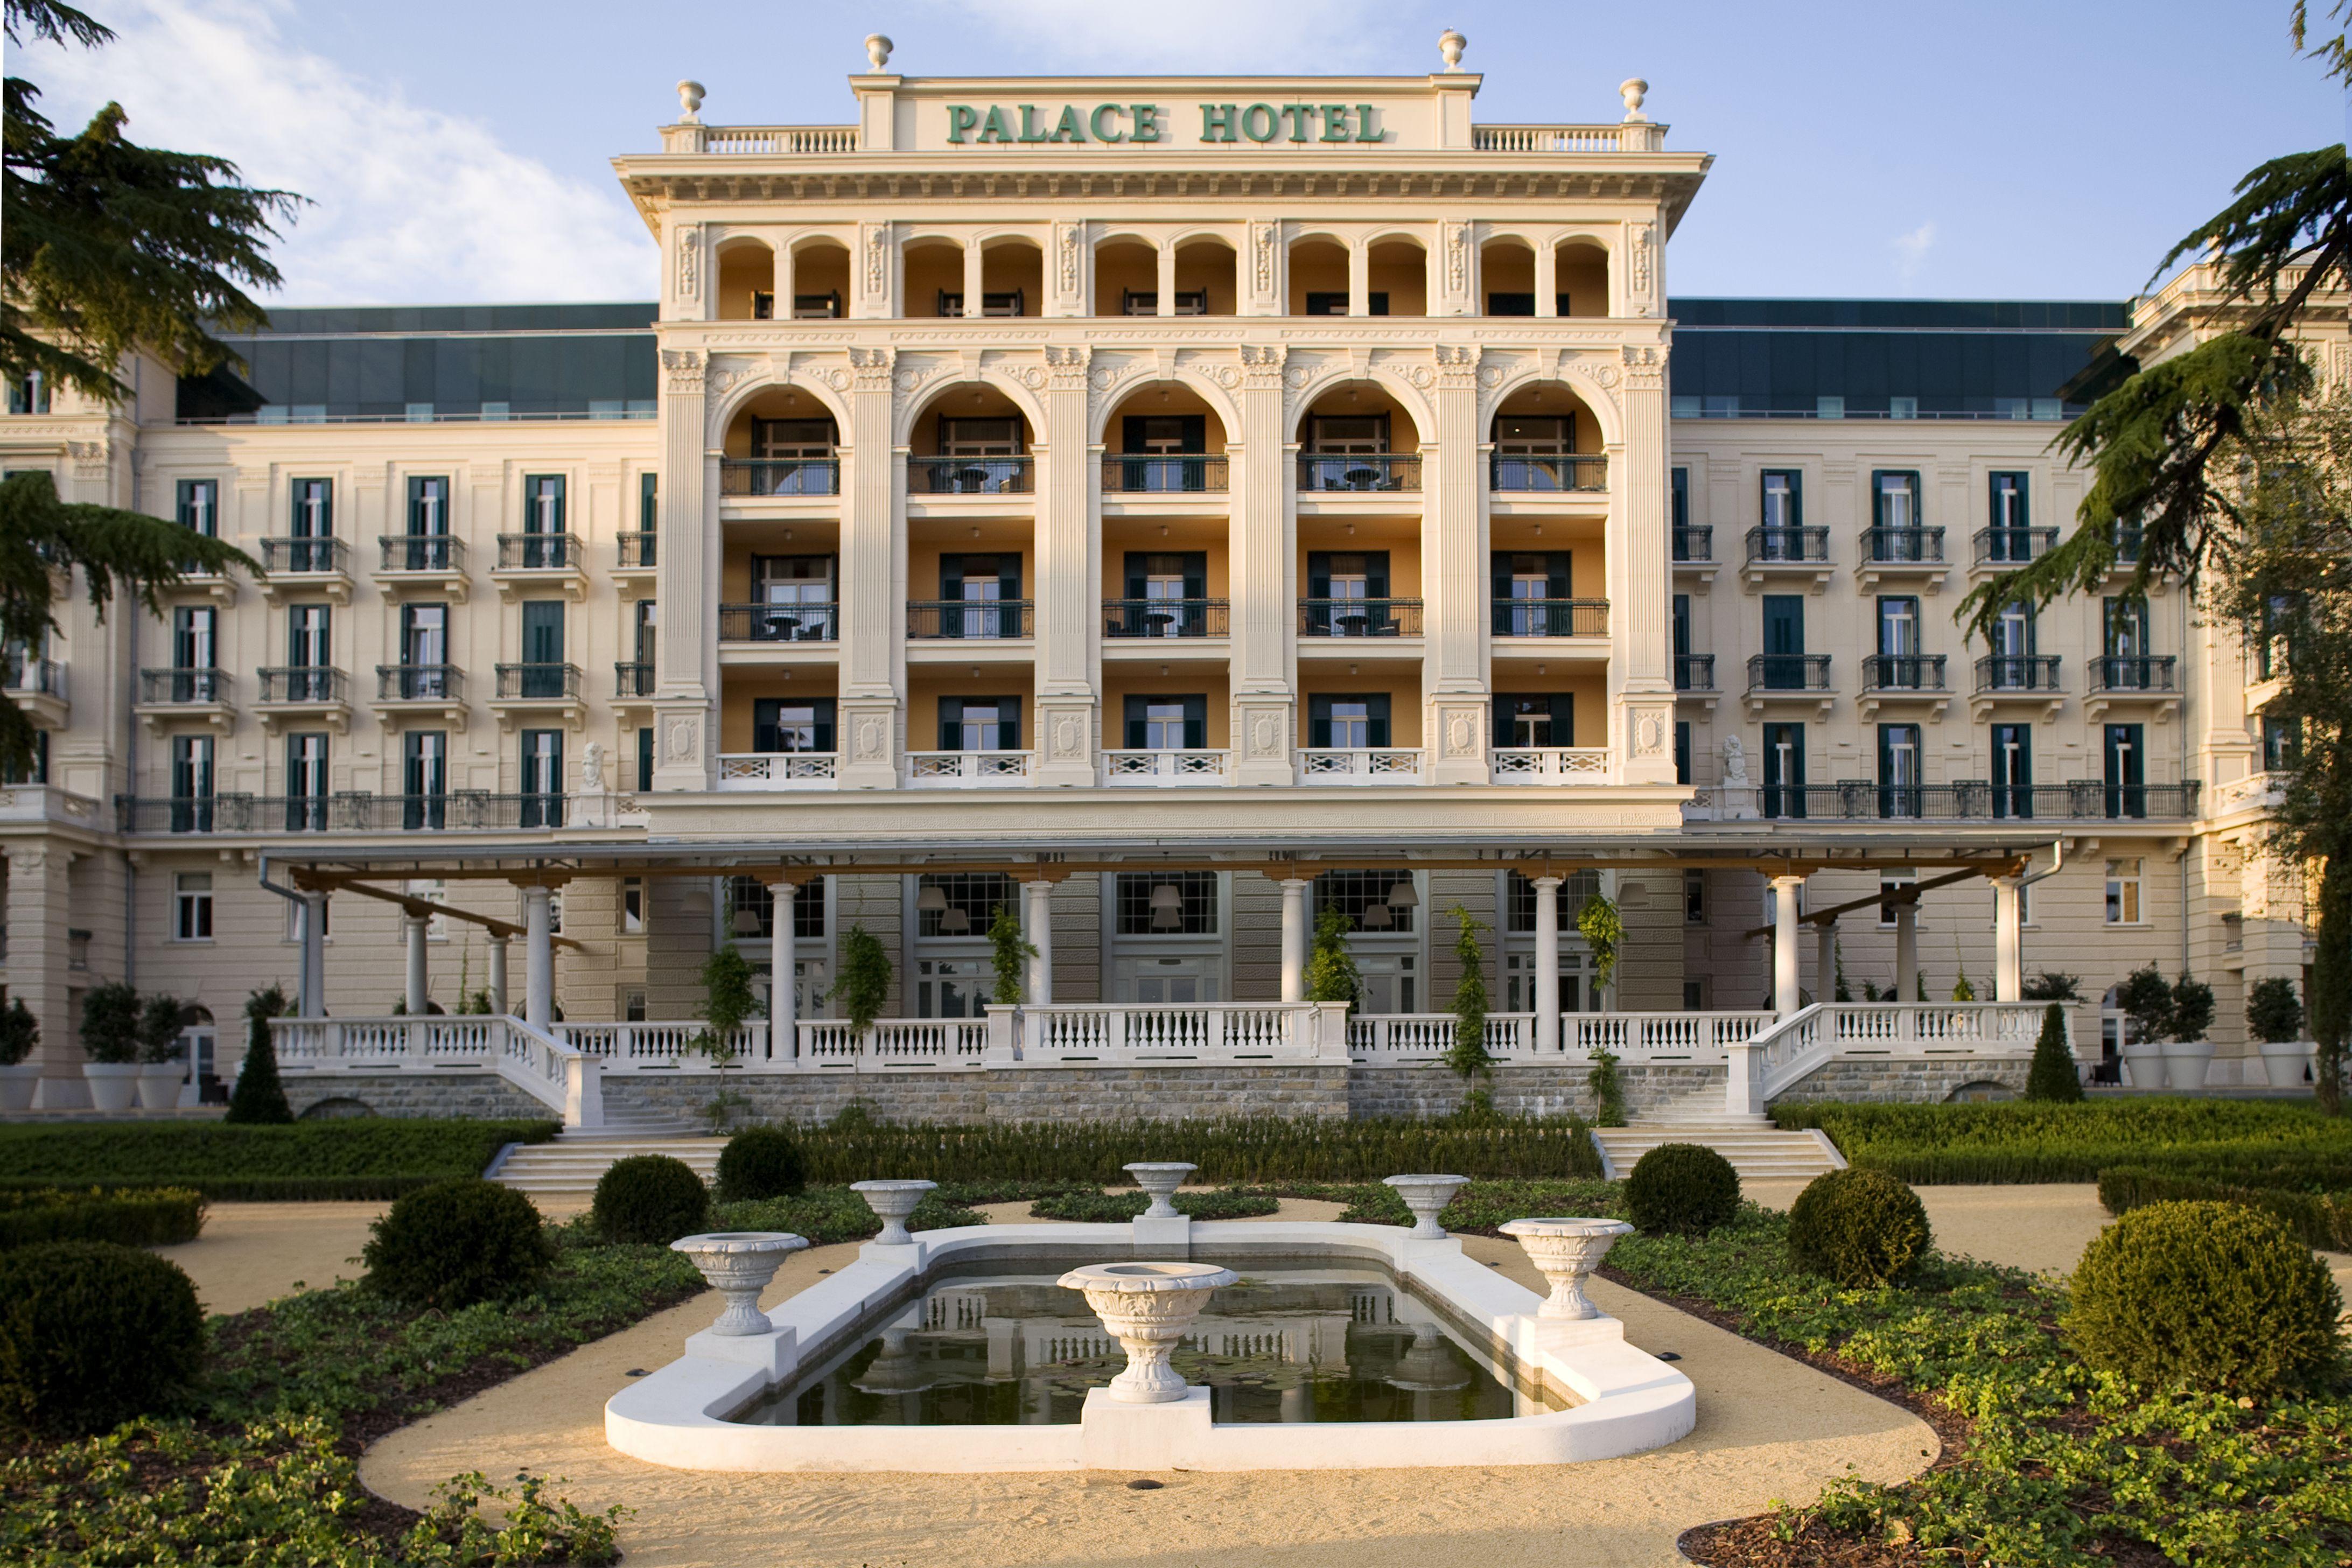 Hotel Palace Portoroz Slovenia M Sora Windows